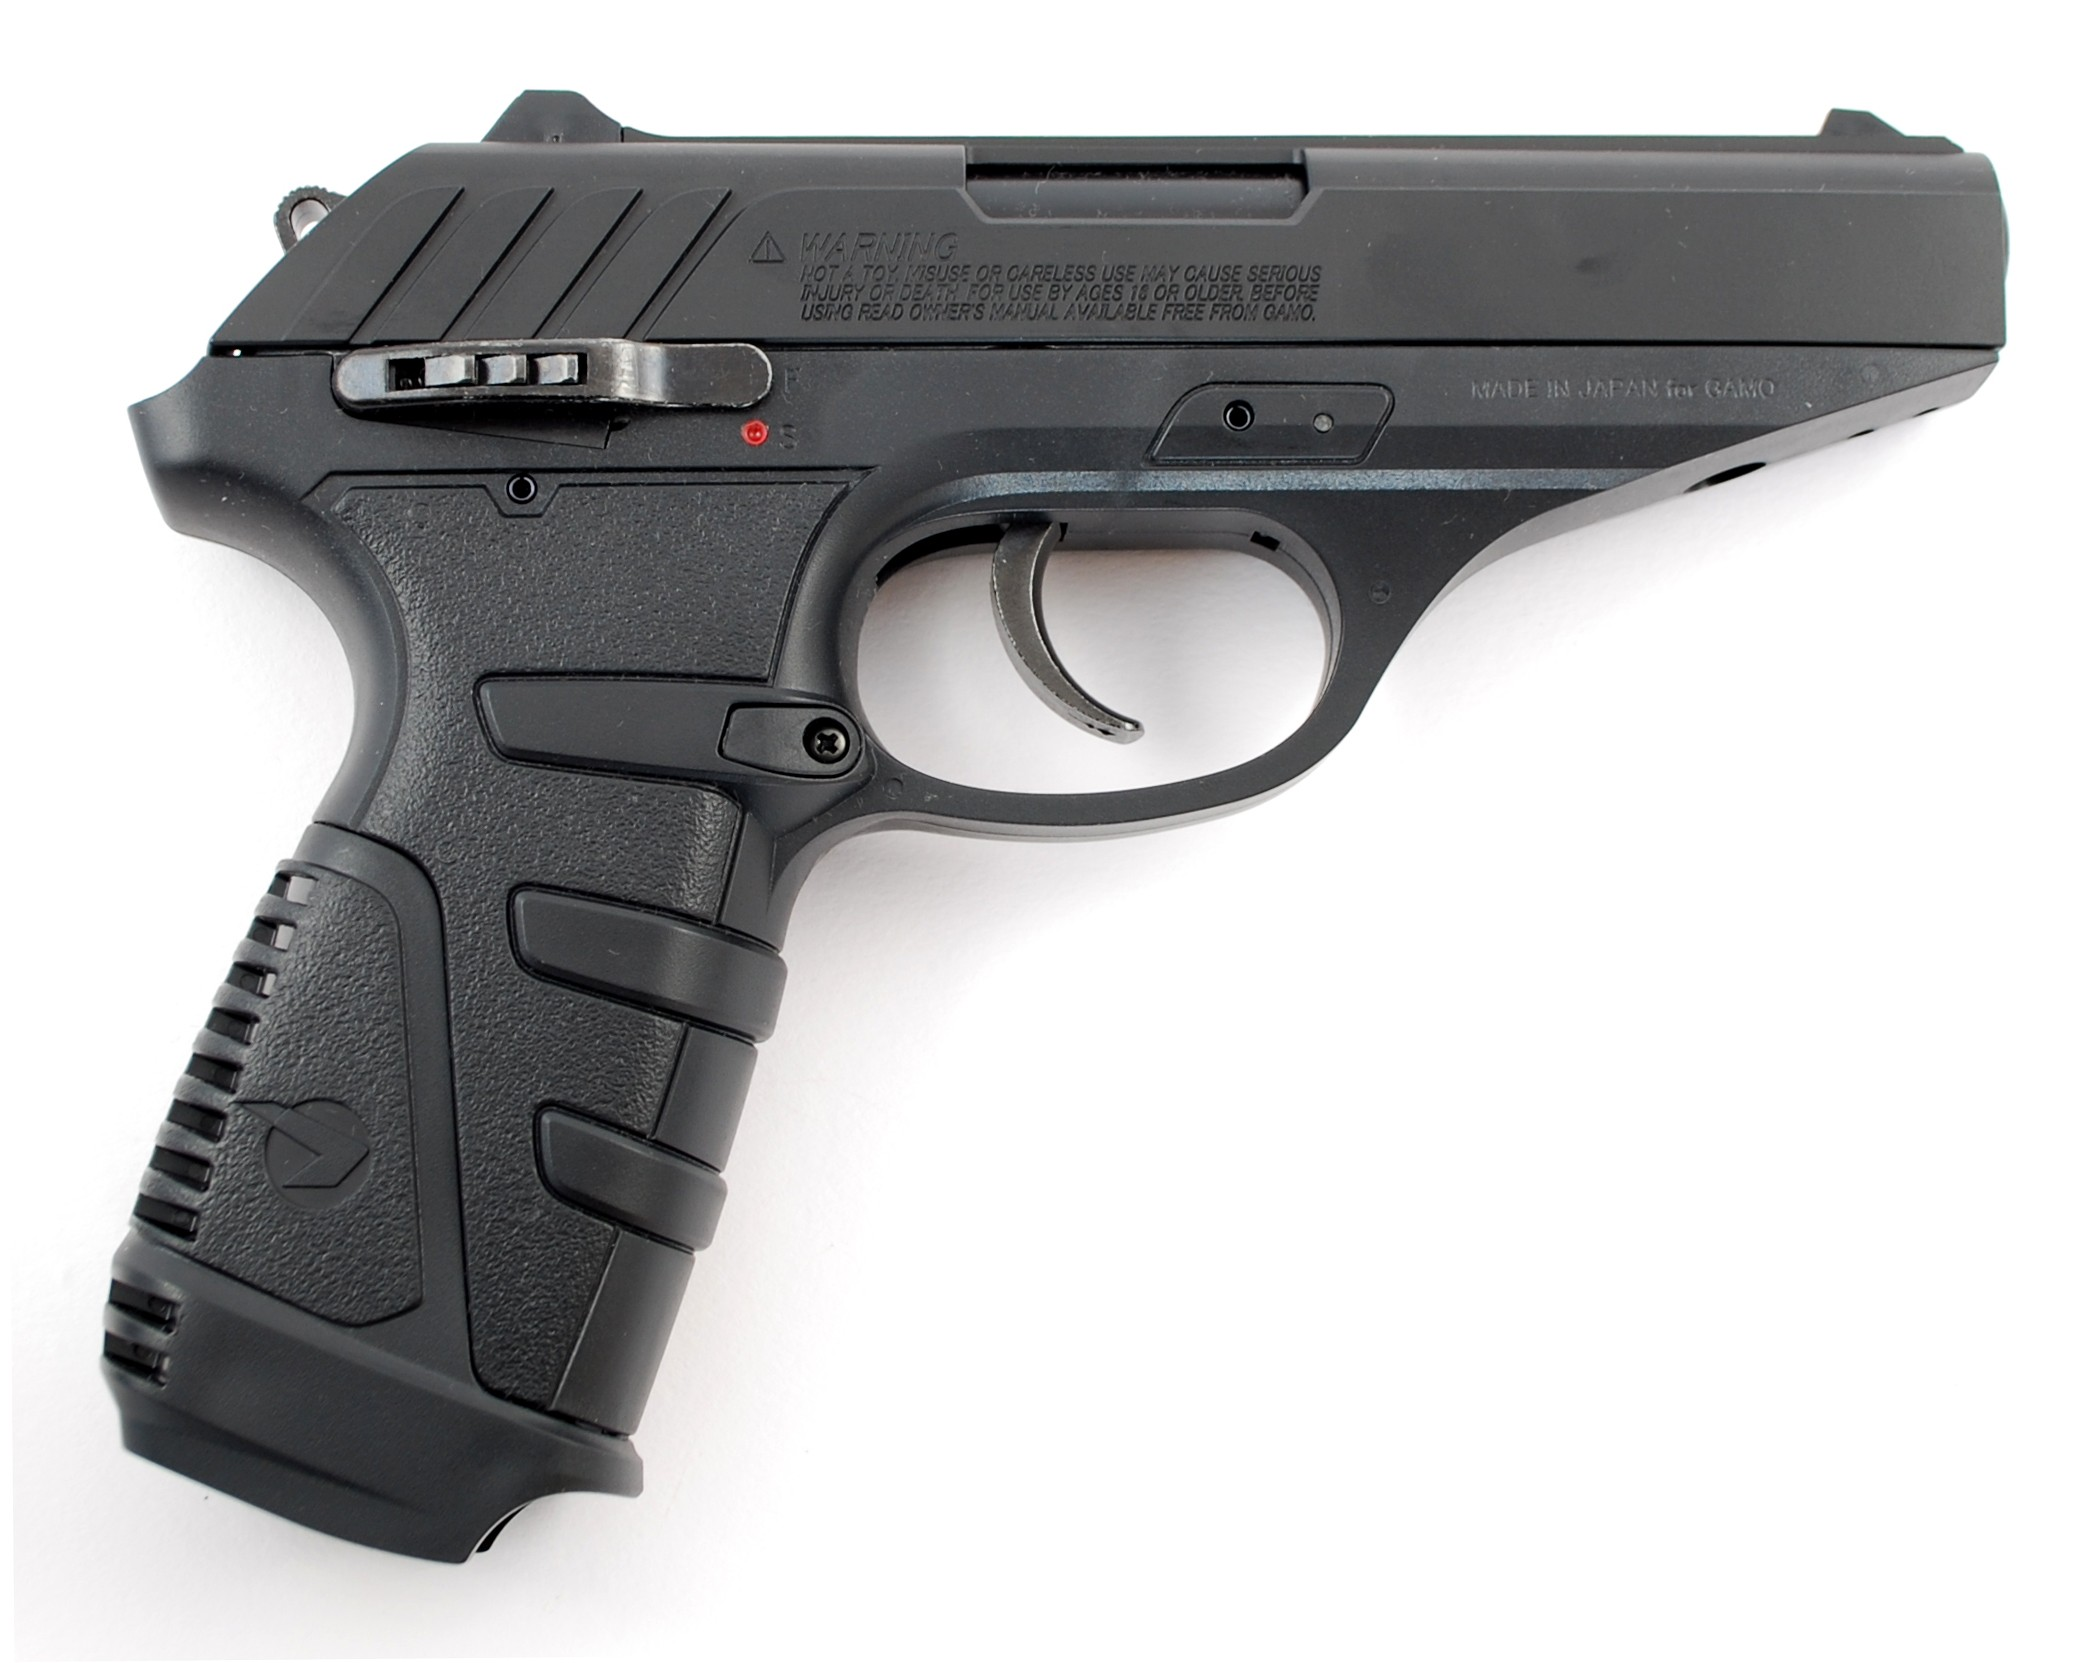 Въздушен пистолет Gamo PT-25 Blowback 4.5 мм